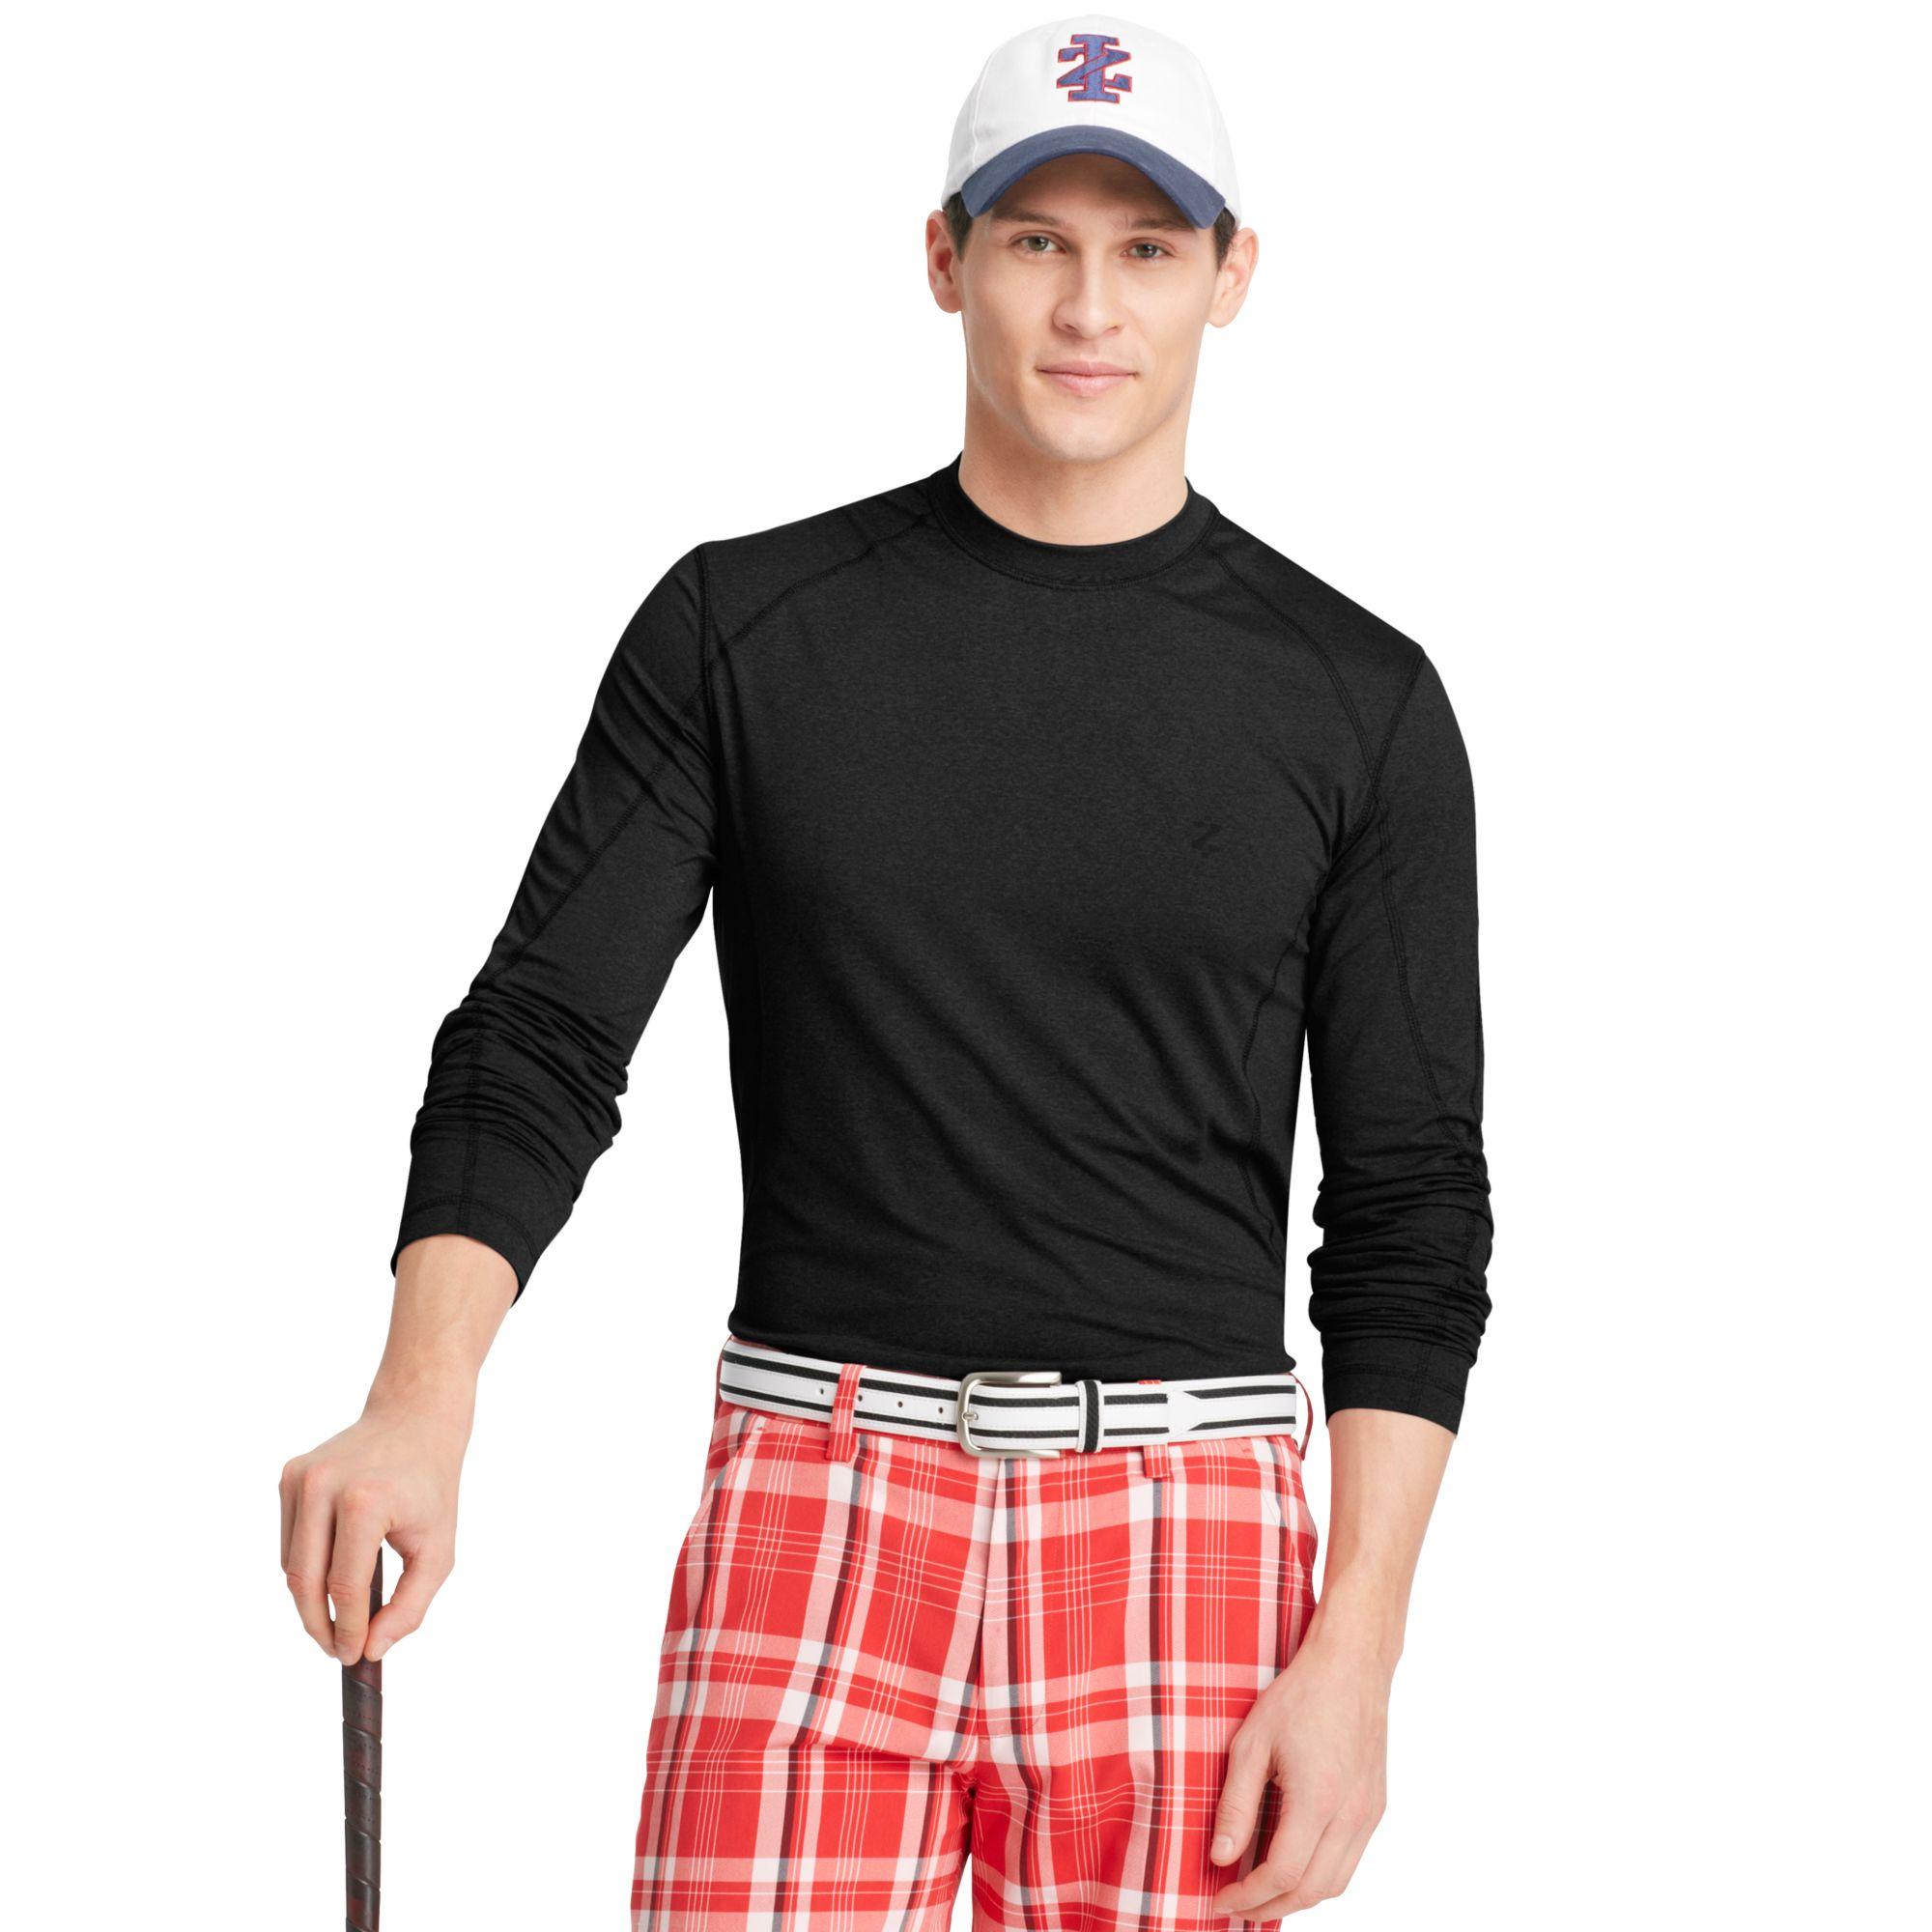 izod izod golf shirt slimfit crew neck longsleeve jersey